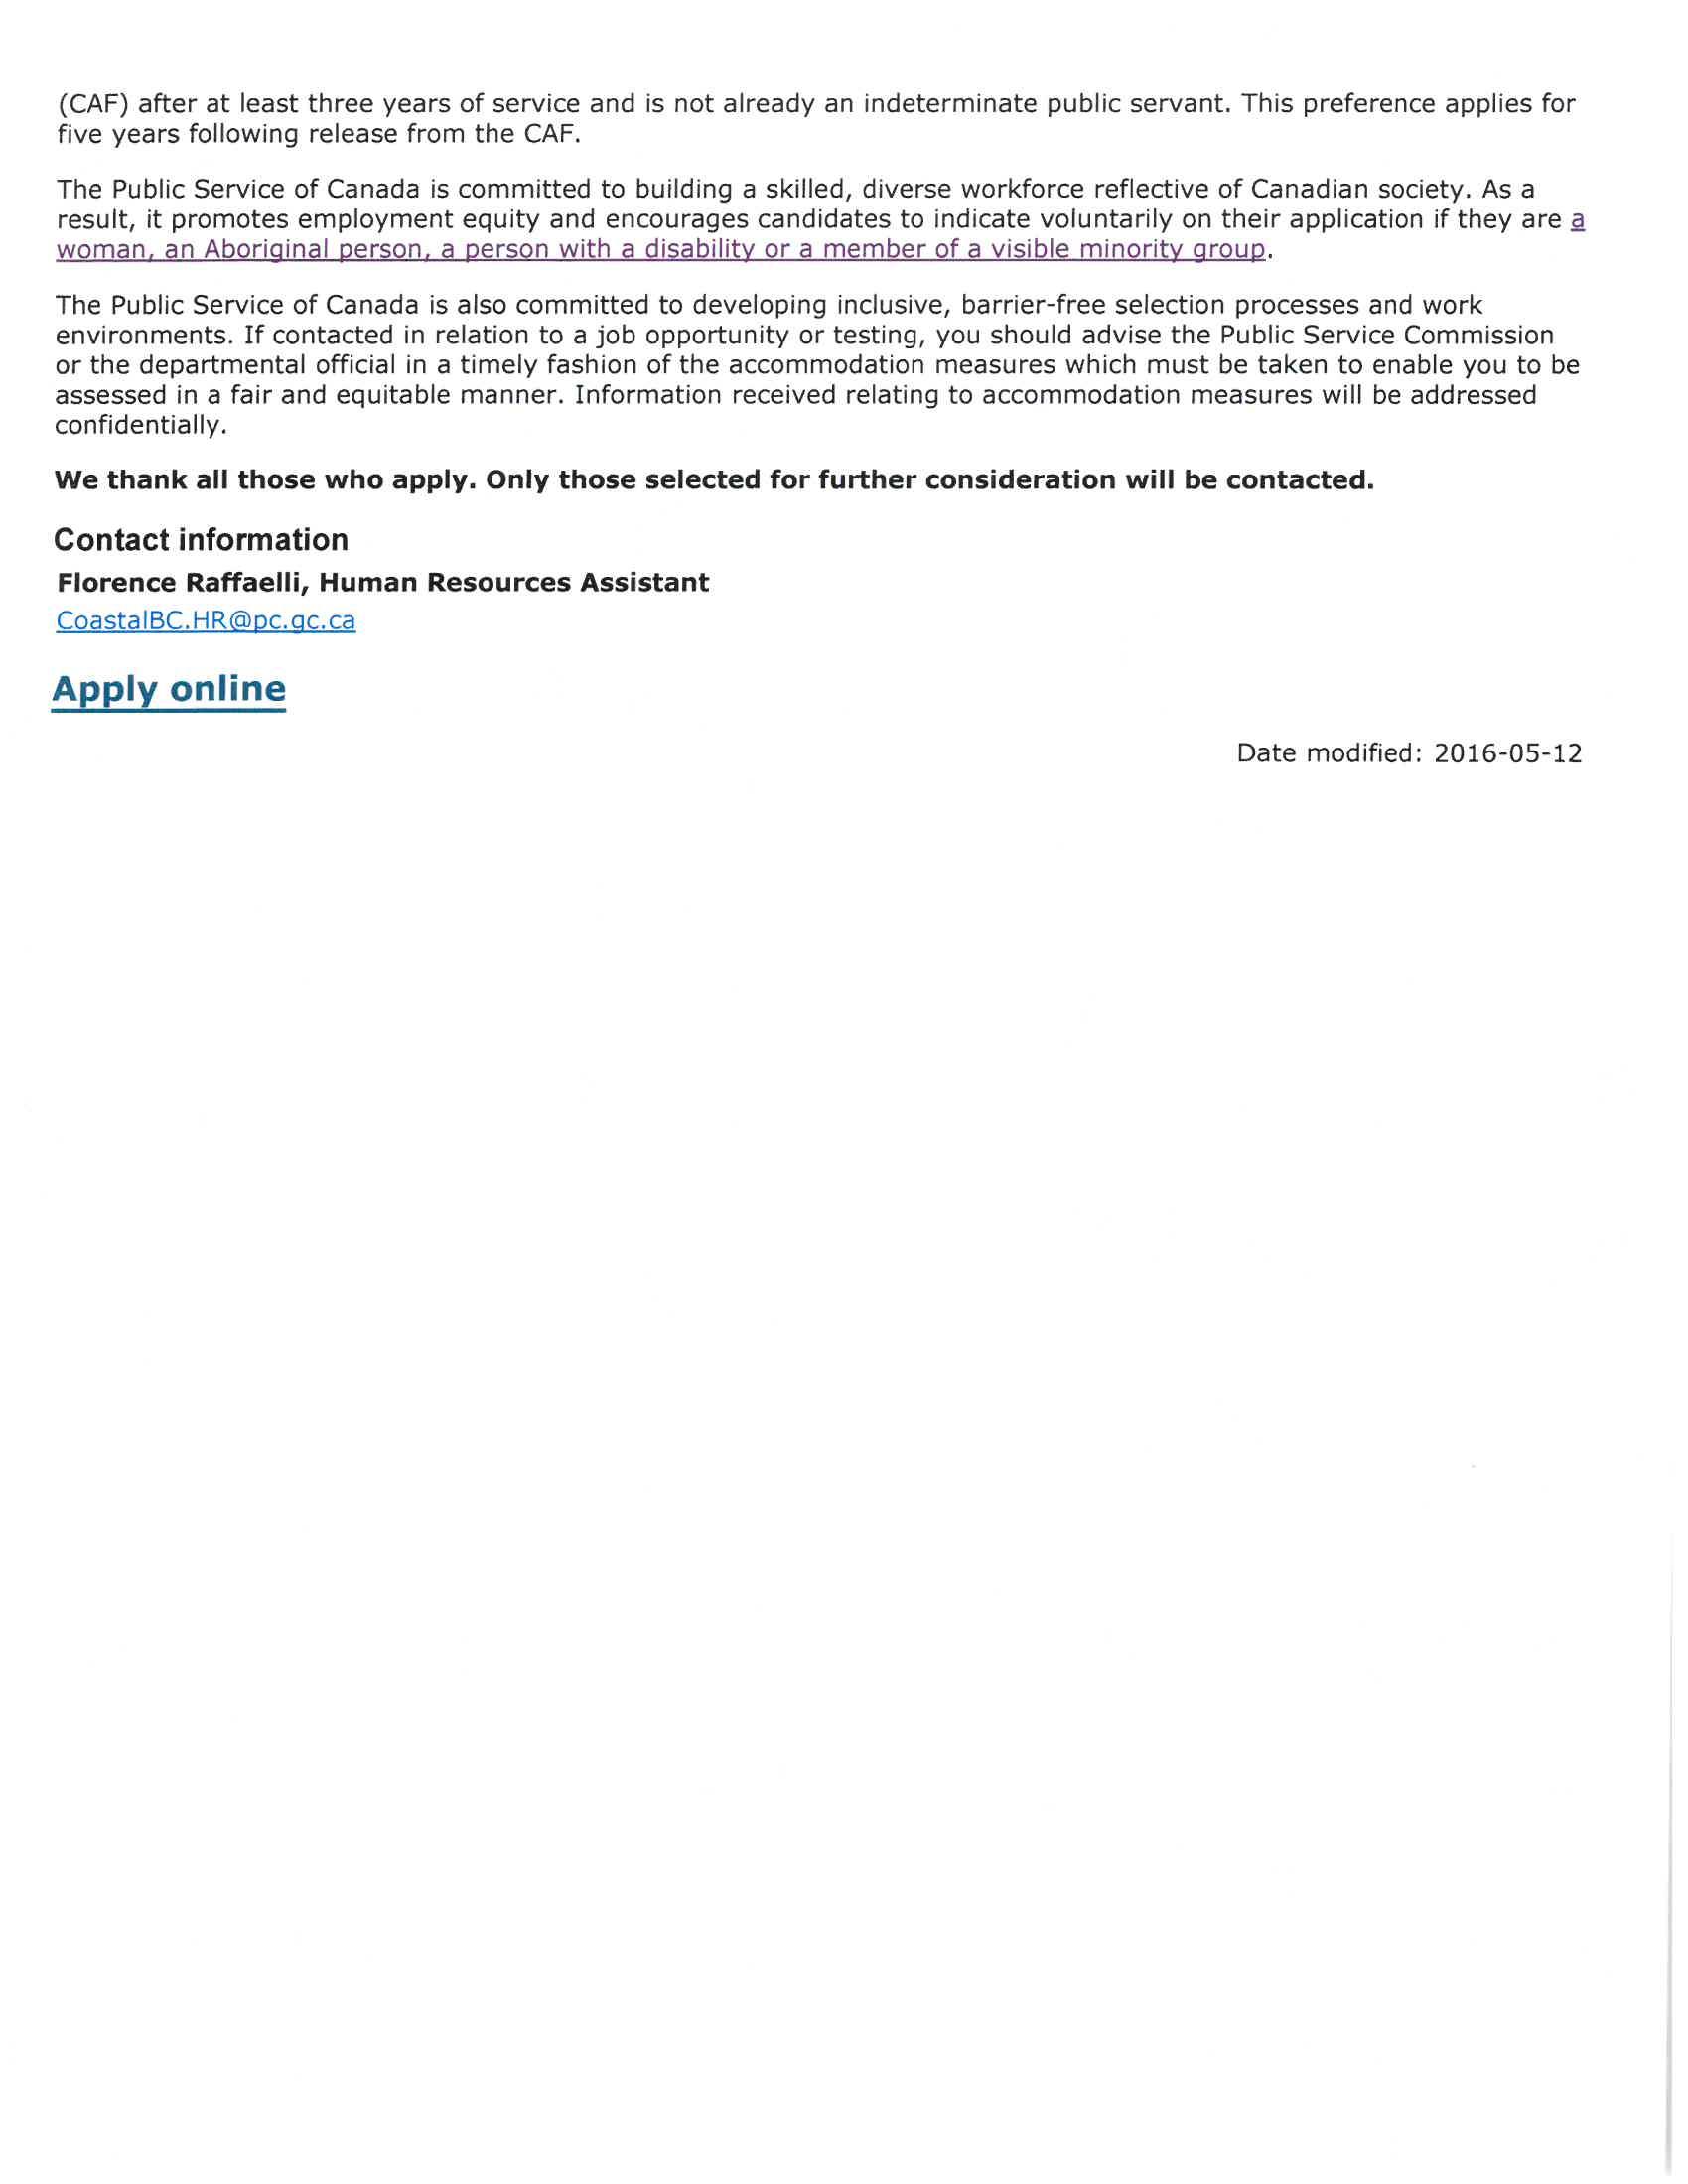 TFN Bulletin June 1-2016 Part 2_Page_06.jpg